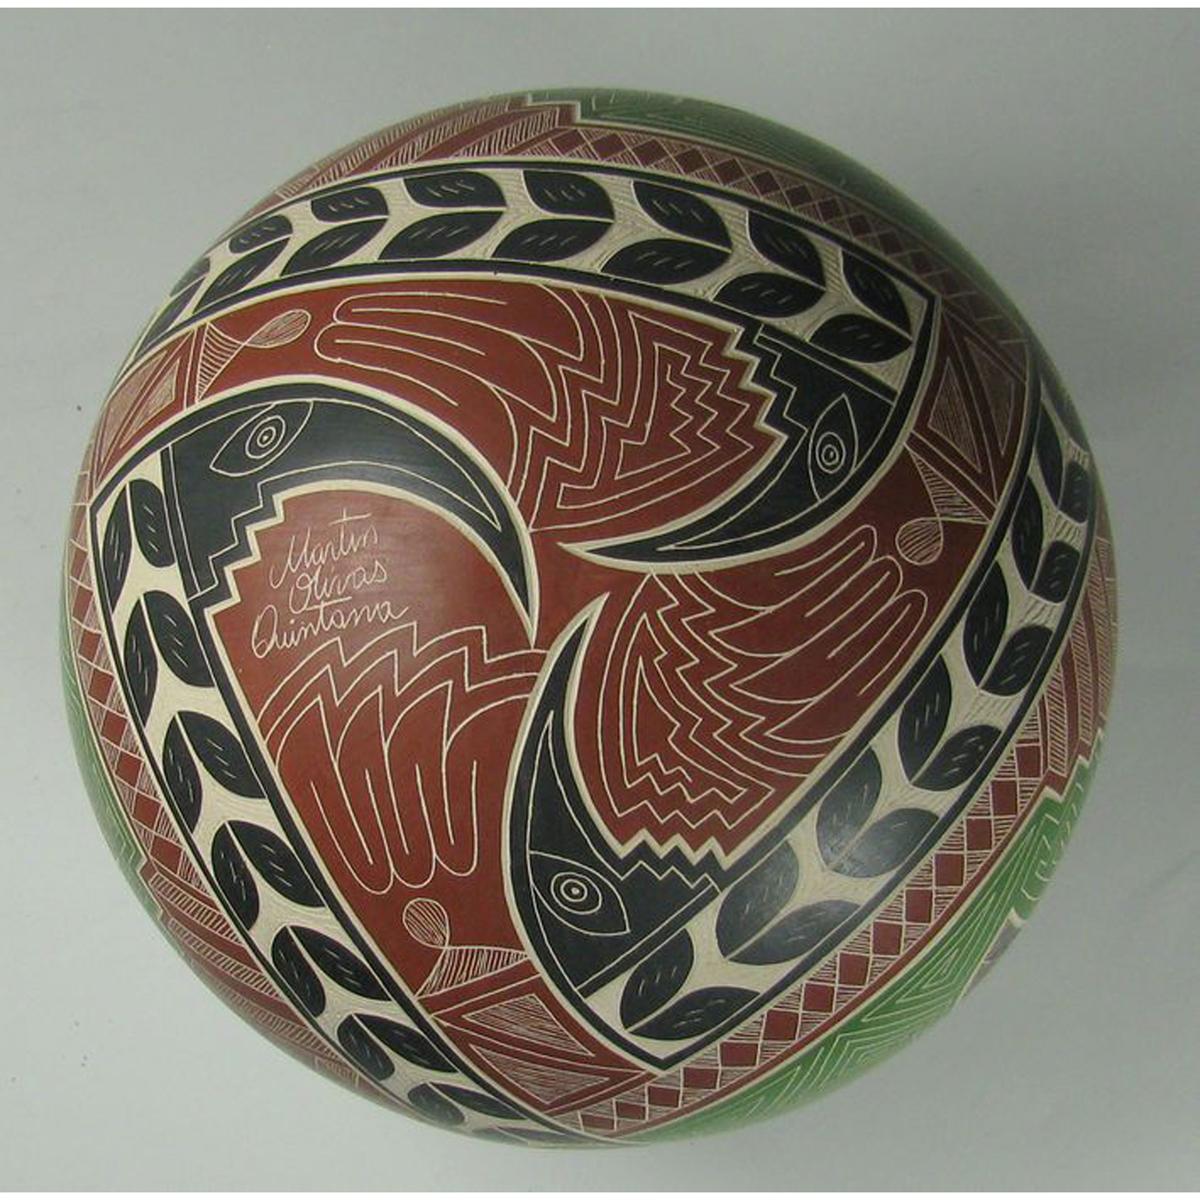 Mata Ortiz Pottery by Martin Quintana